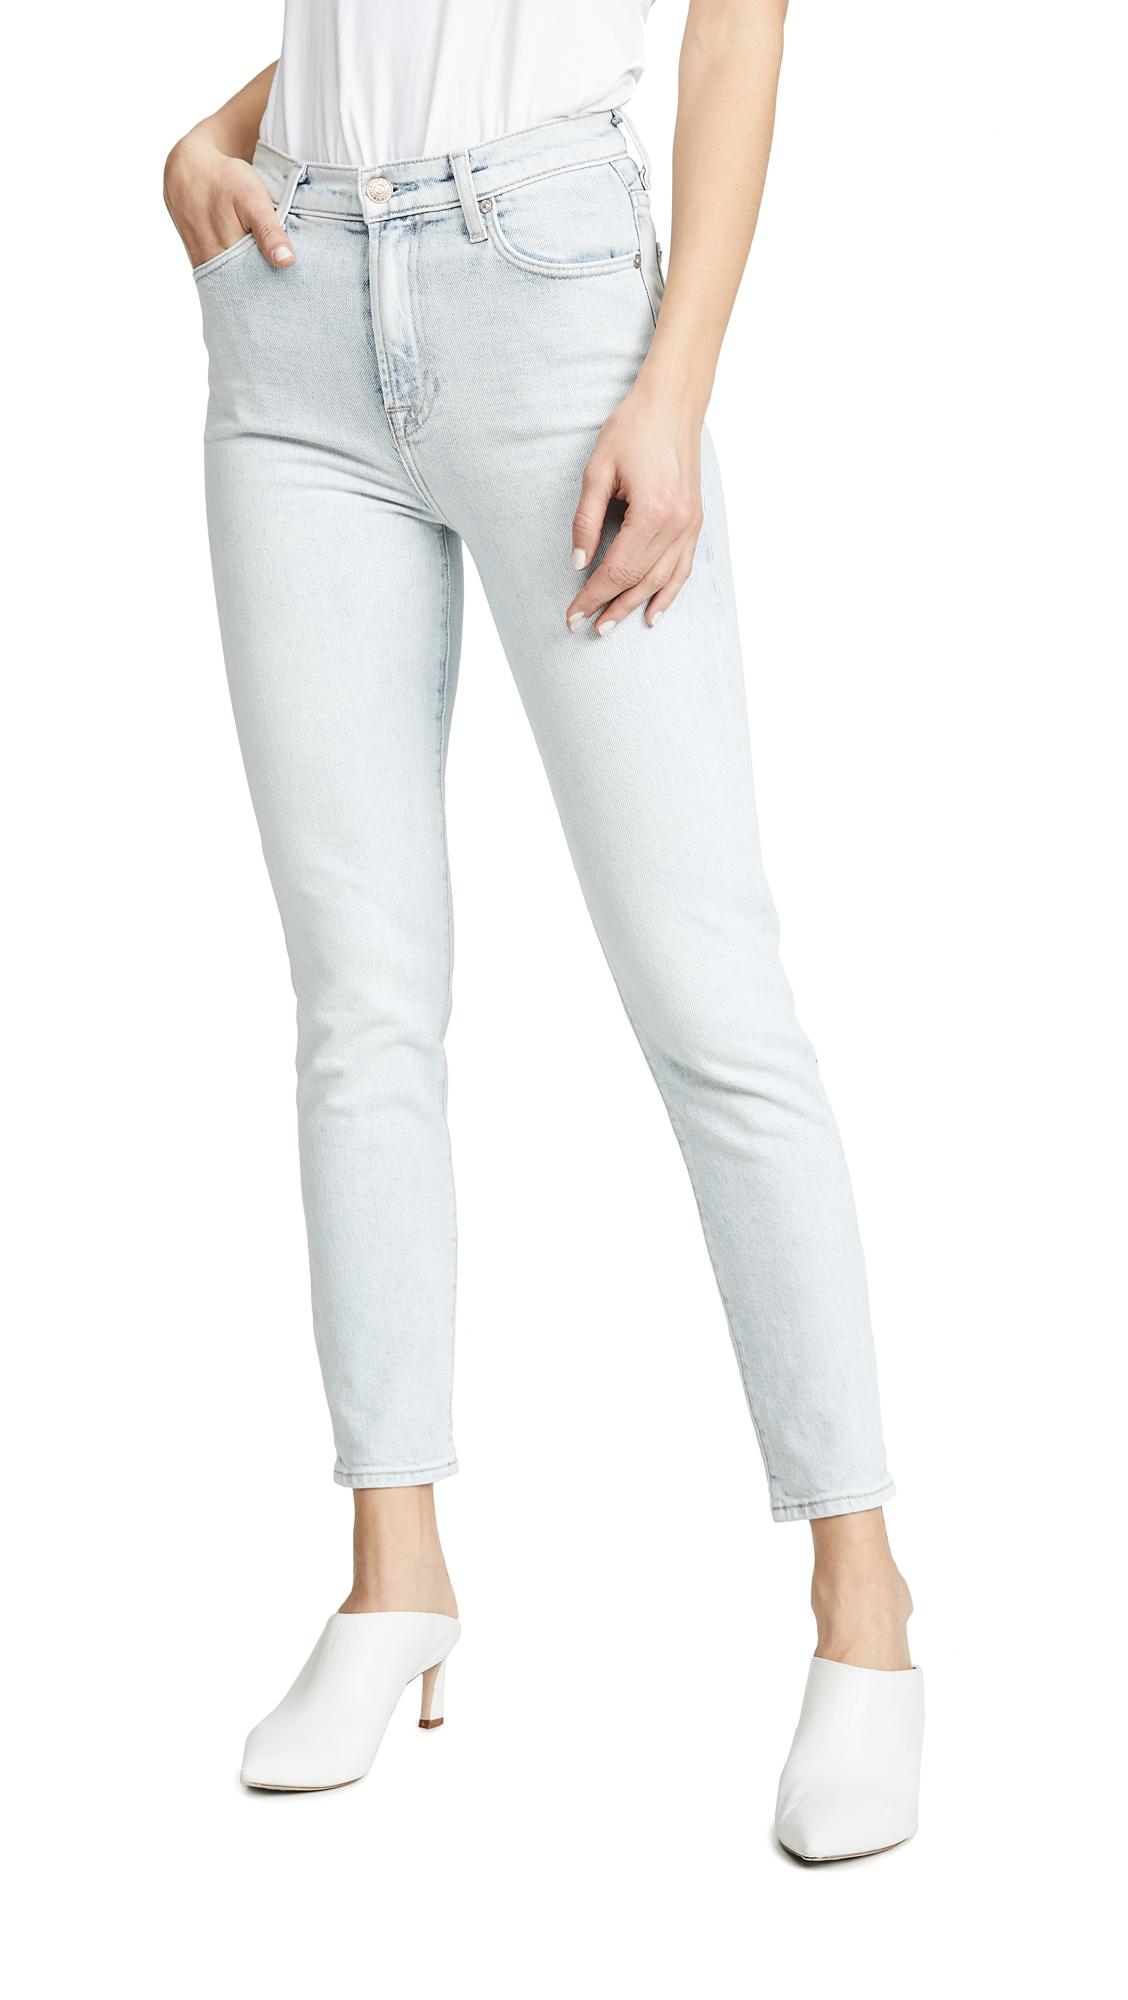 7 For All Mankind High Waist Slim Jeans - Desert Sun Bleached